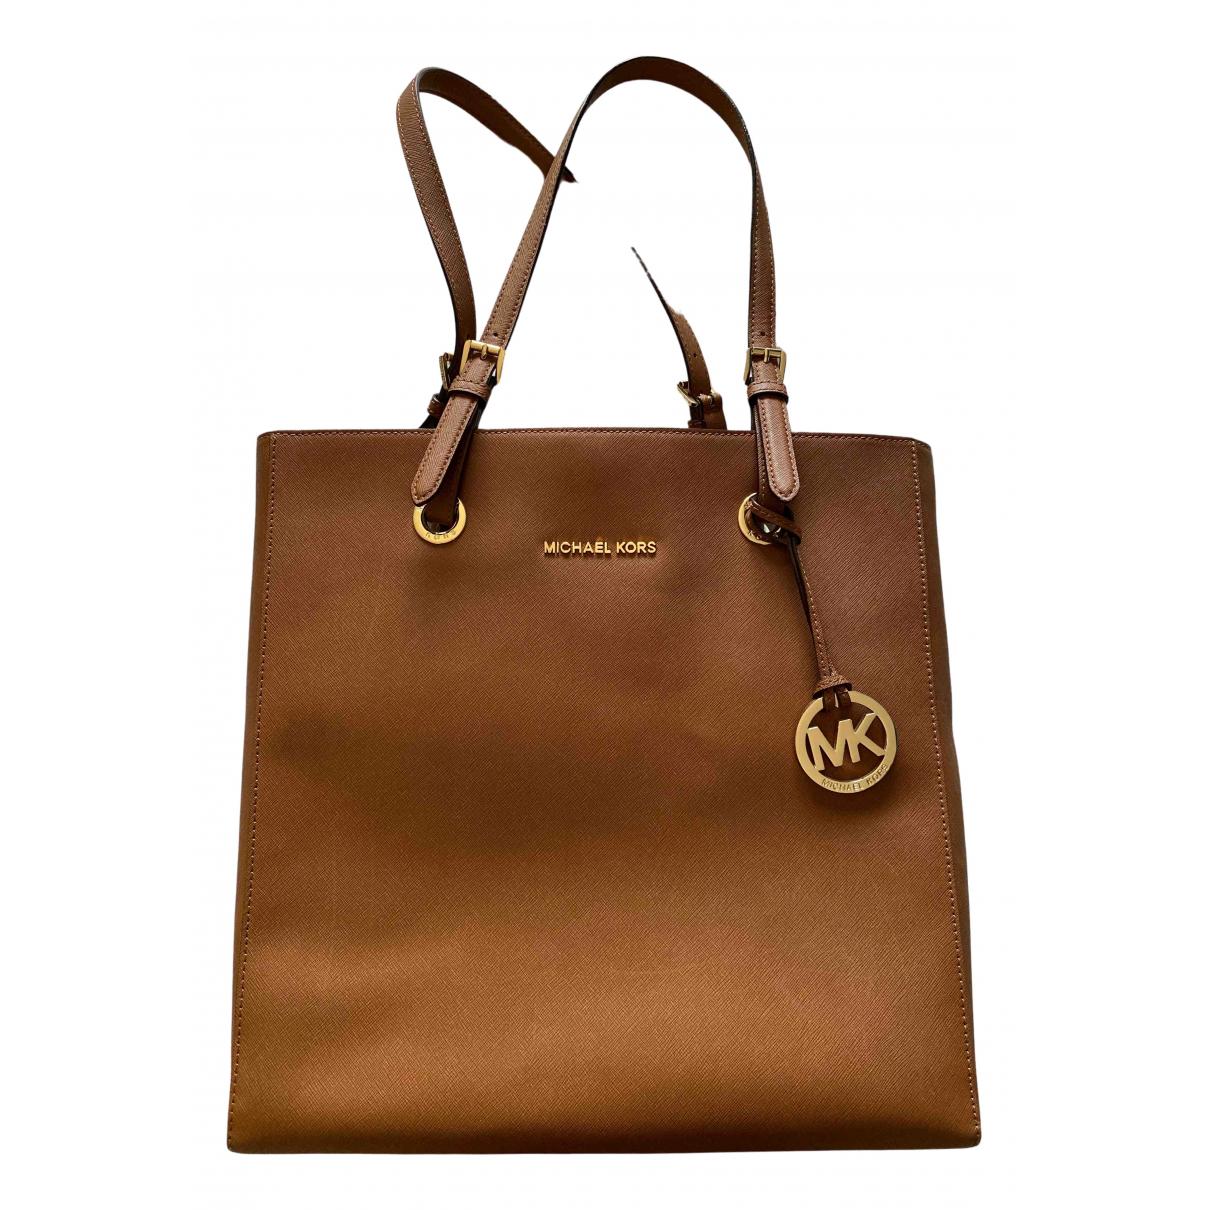 Michael Kors Sady Camel Leather handbag for Women \N